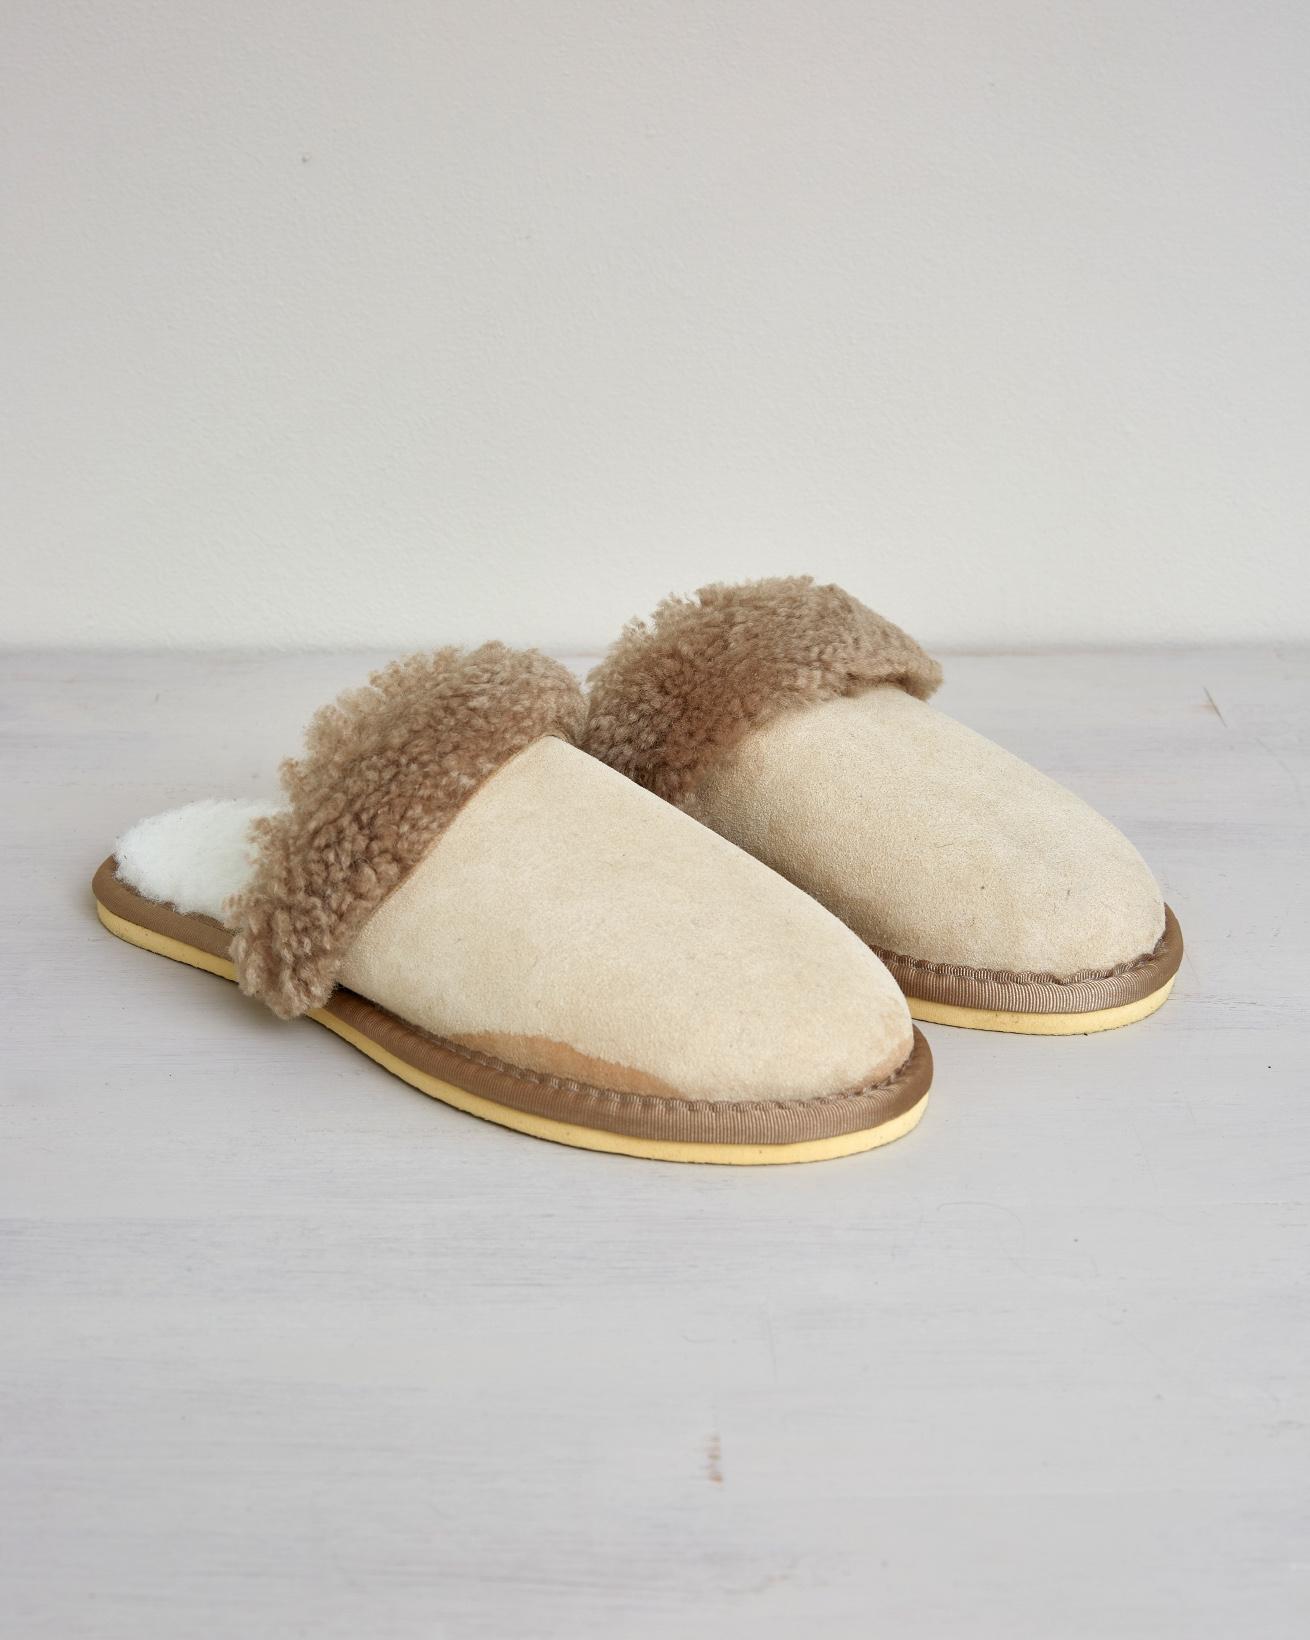 Ladies Turnback Mule - Size 5 - Oatmeal - 2646